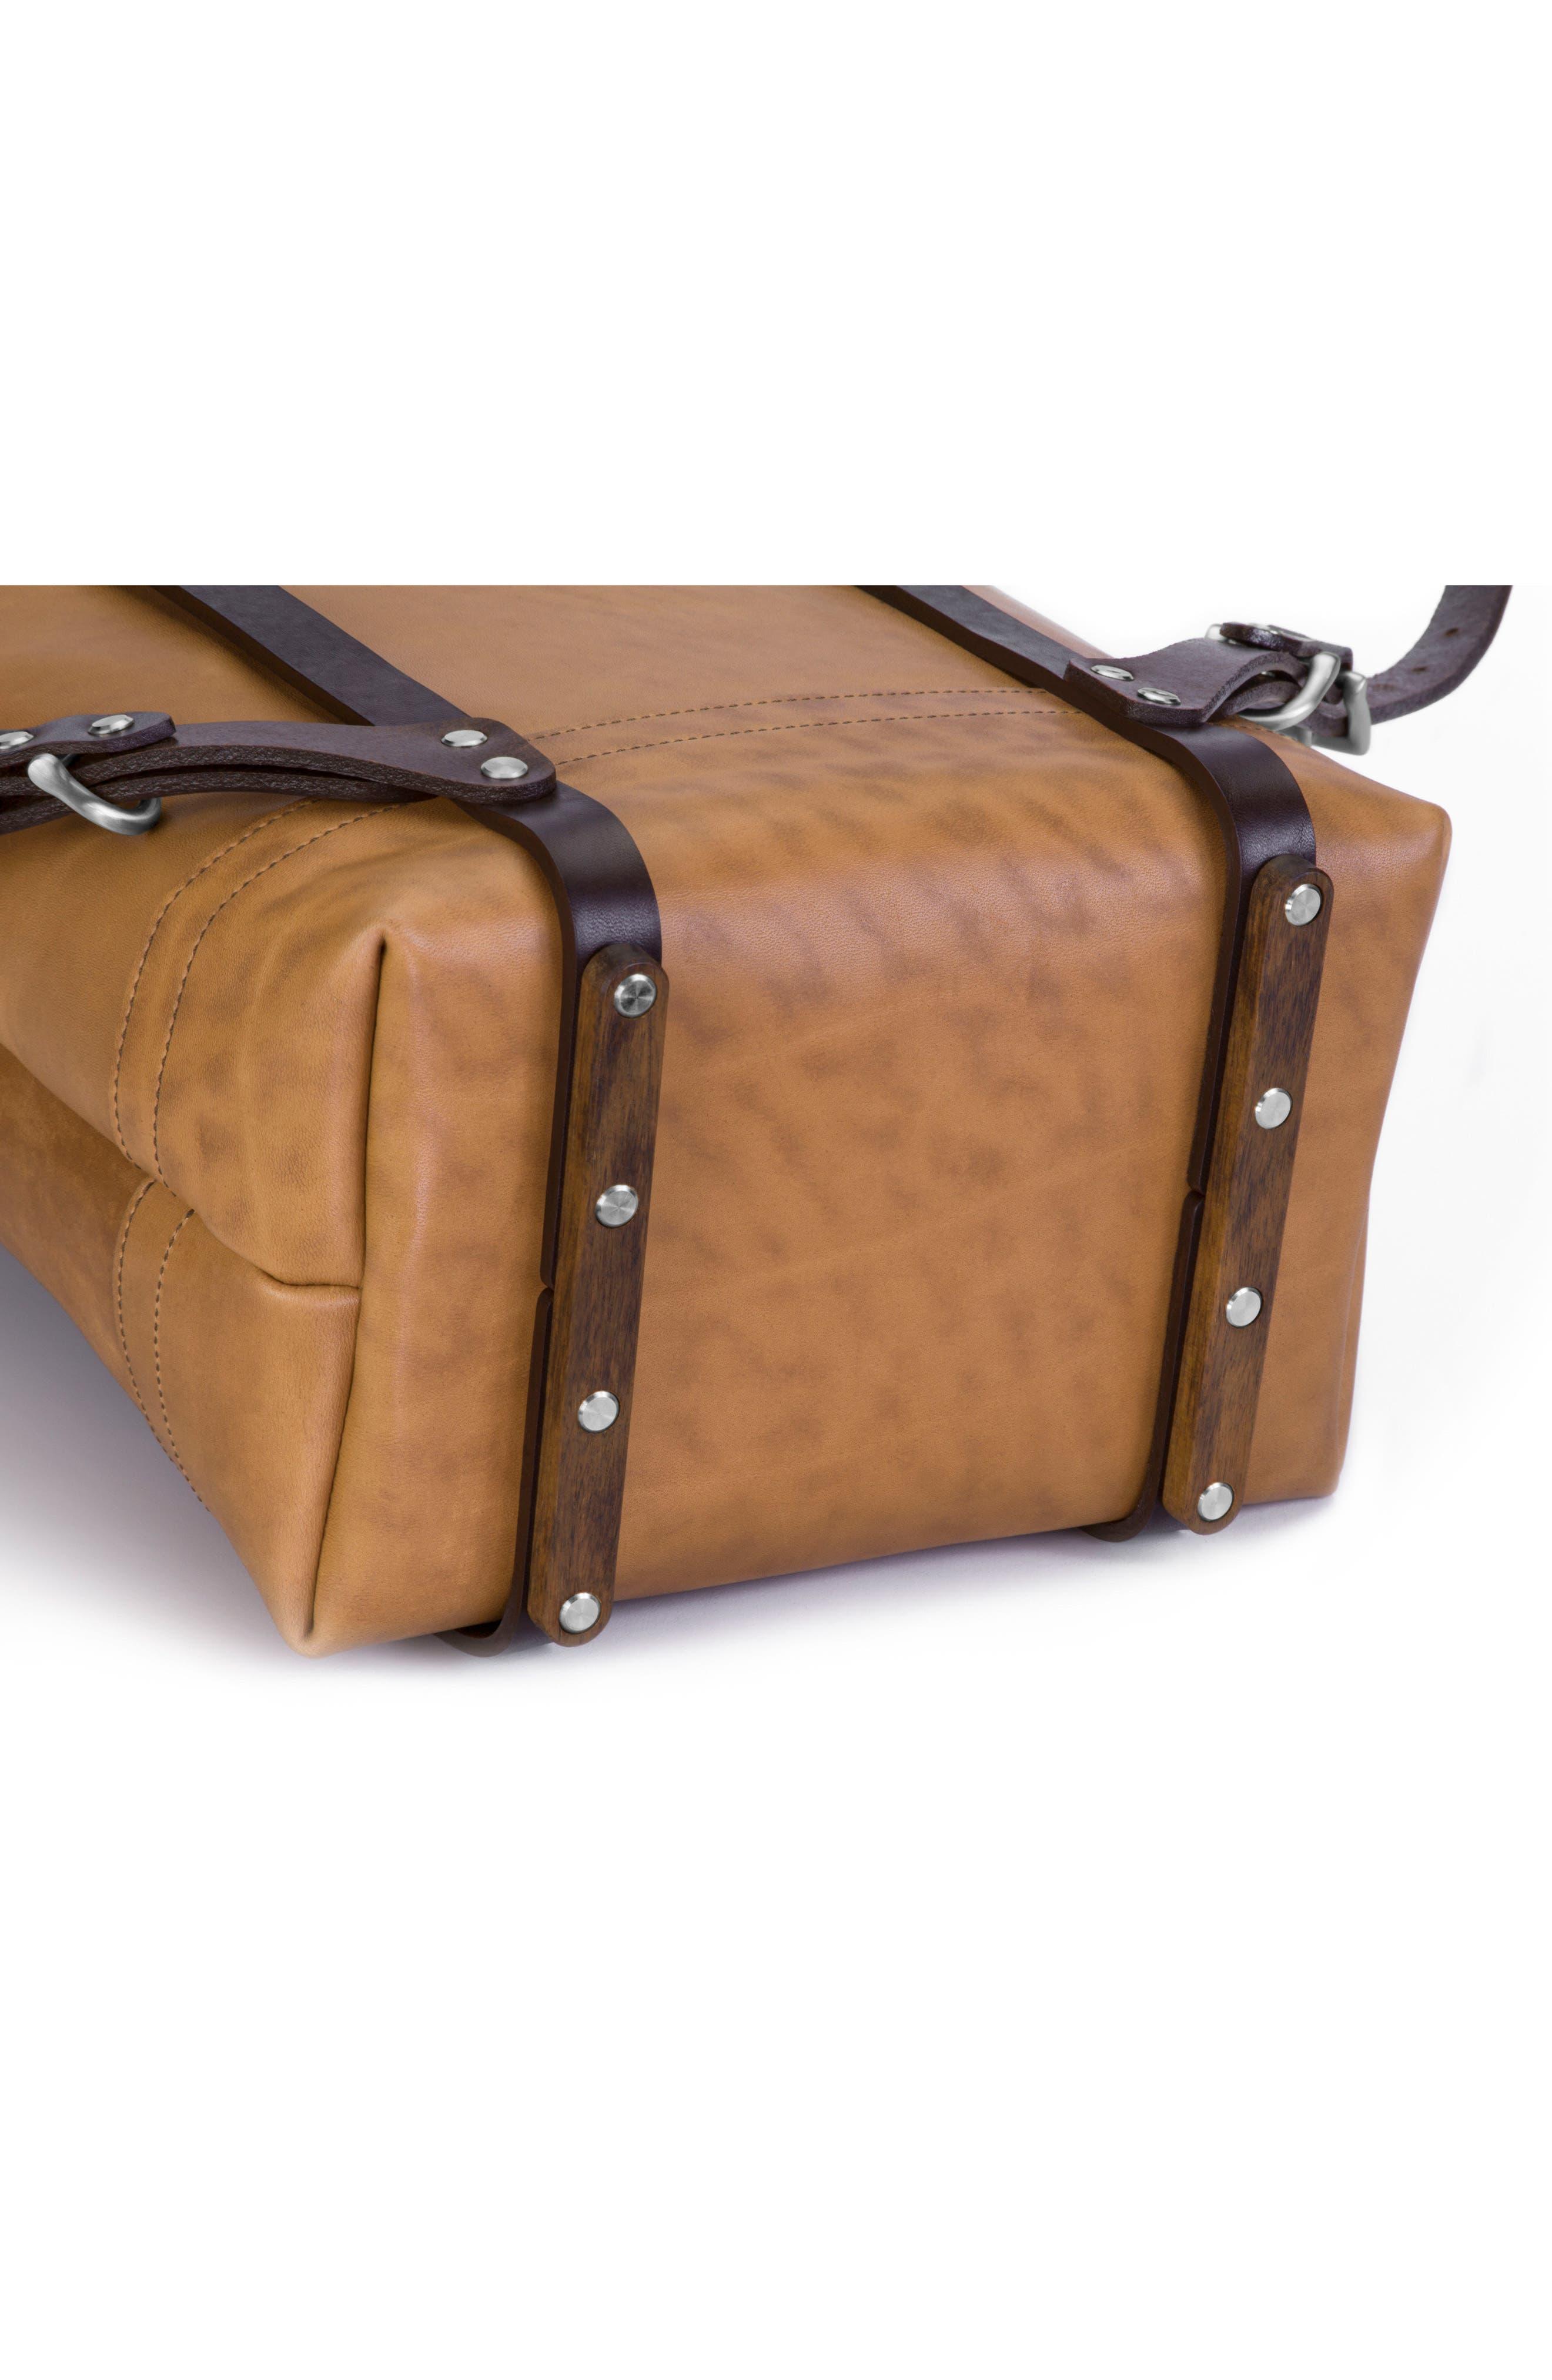 Keystone Nickel Detail Leather Rucksack,                             Alternate thumbnail 5, color,                             WHISKEY / NICKEL